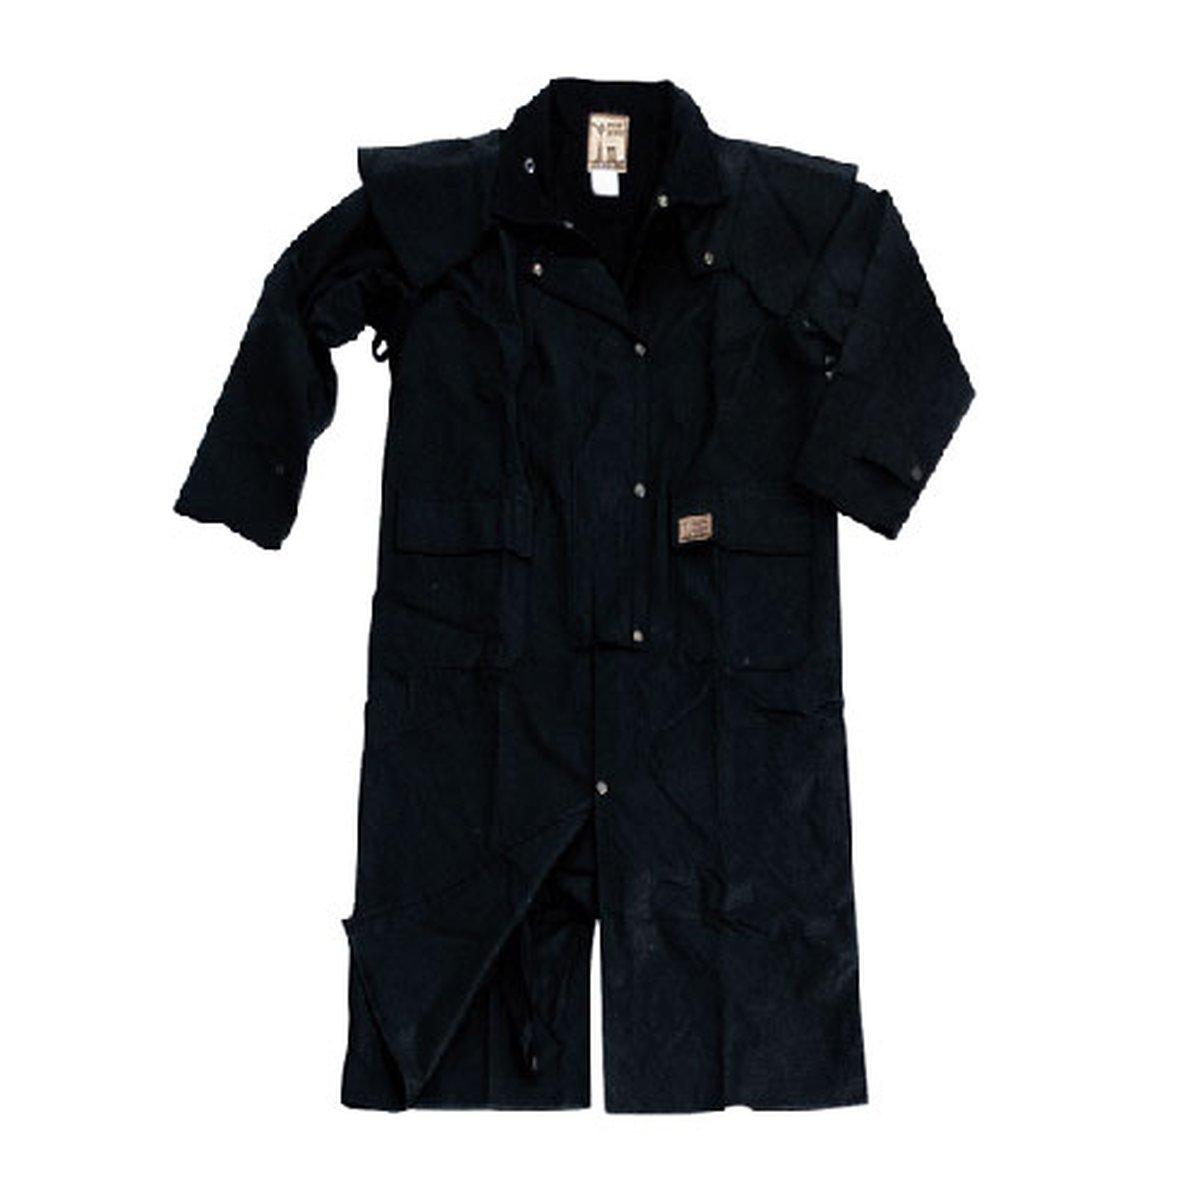 Afbeelding van Bush Skin Riding Coat Zwart Small